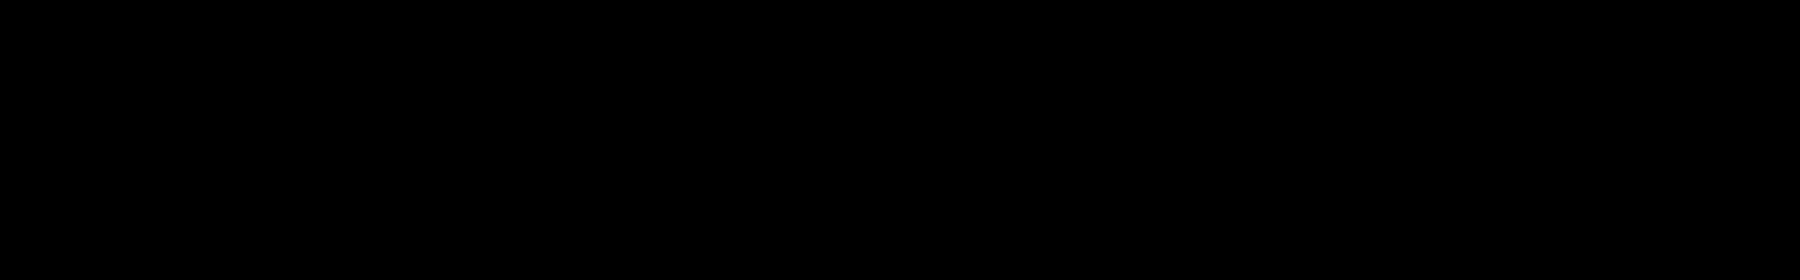 Delight for Omnisphere 2 by Joseph Hollo audio waveform